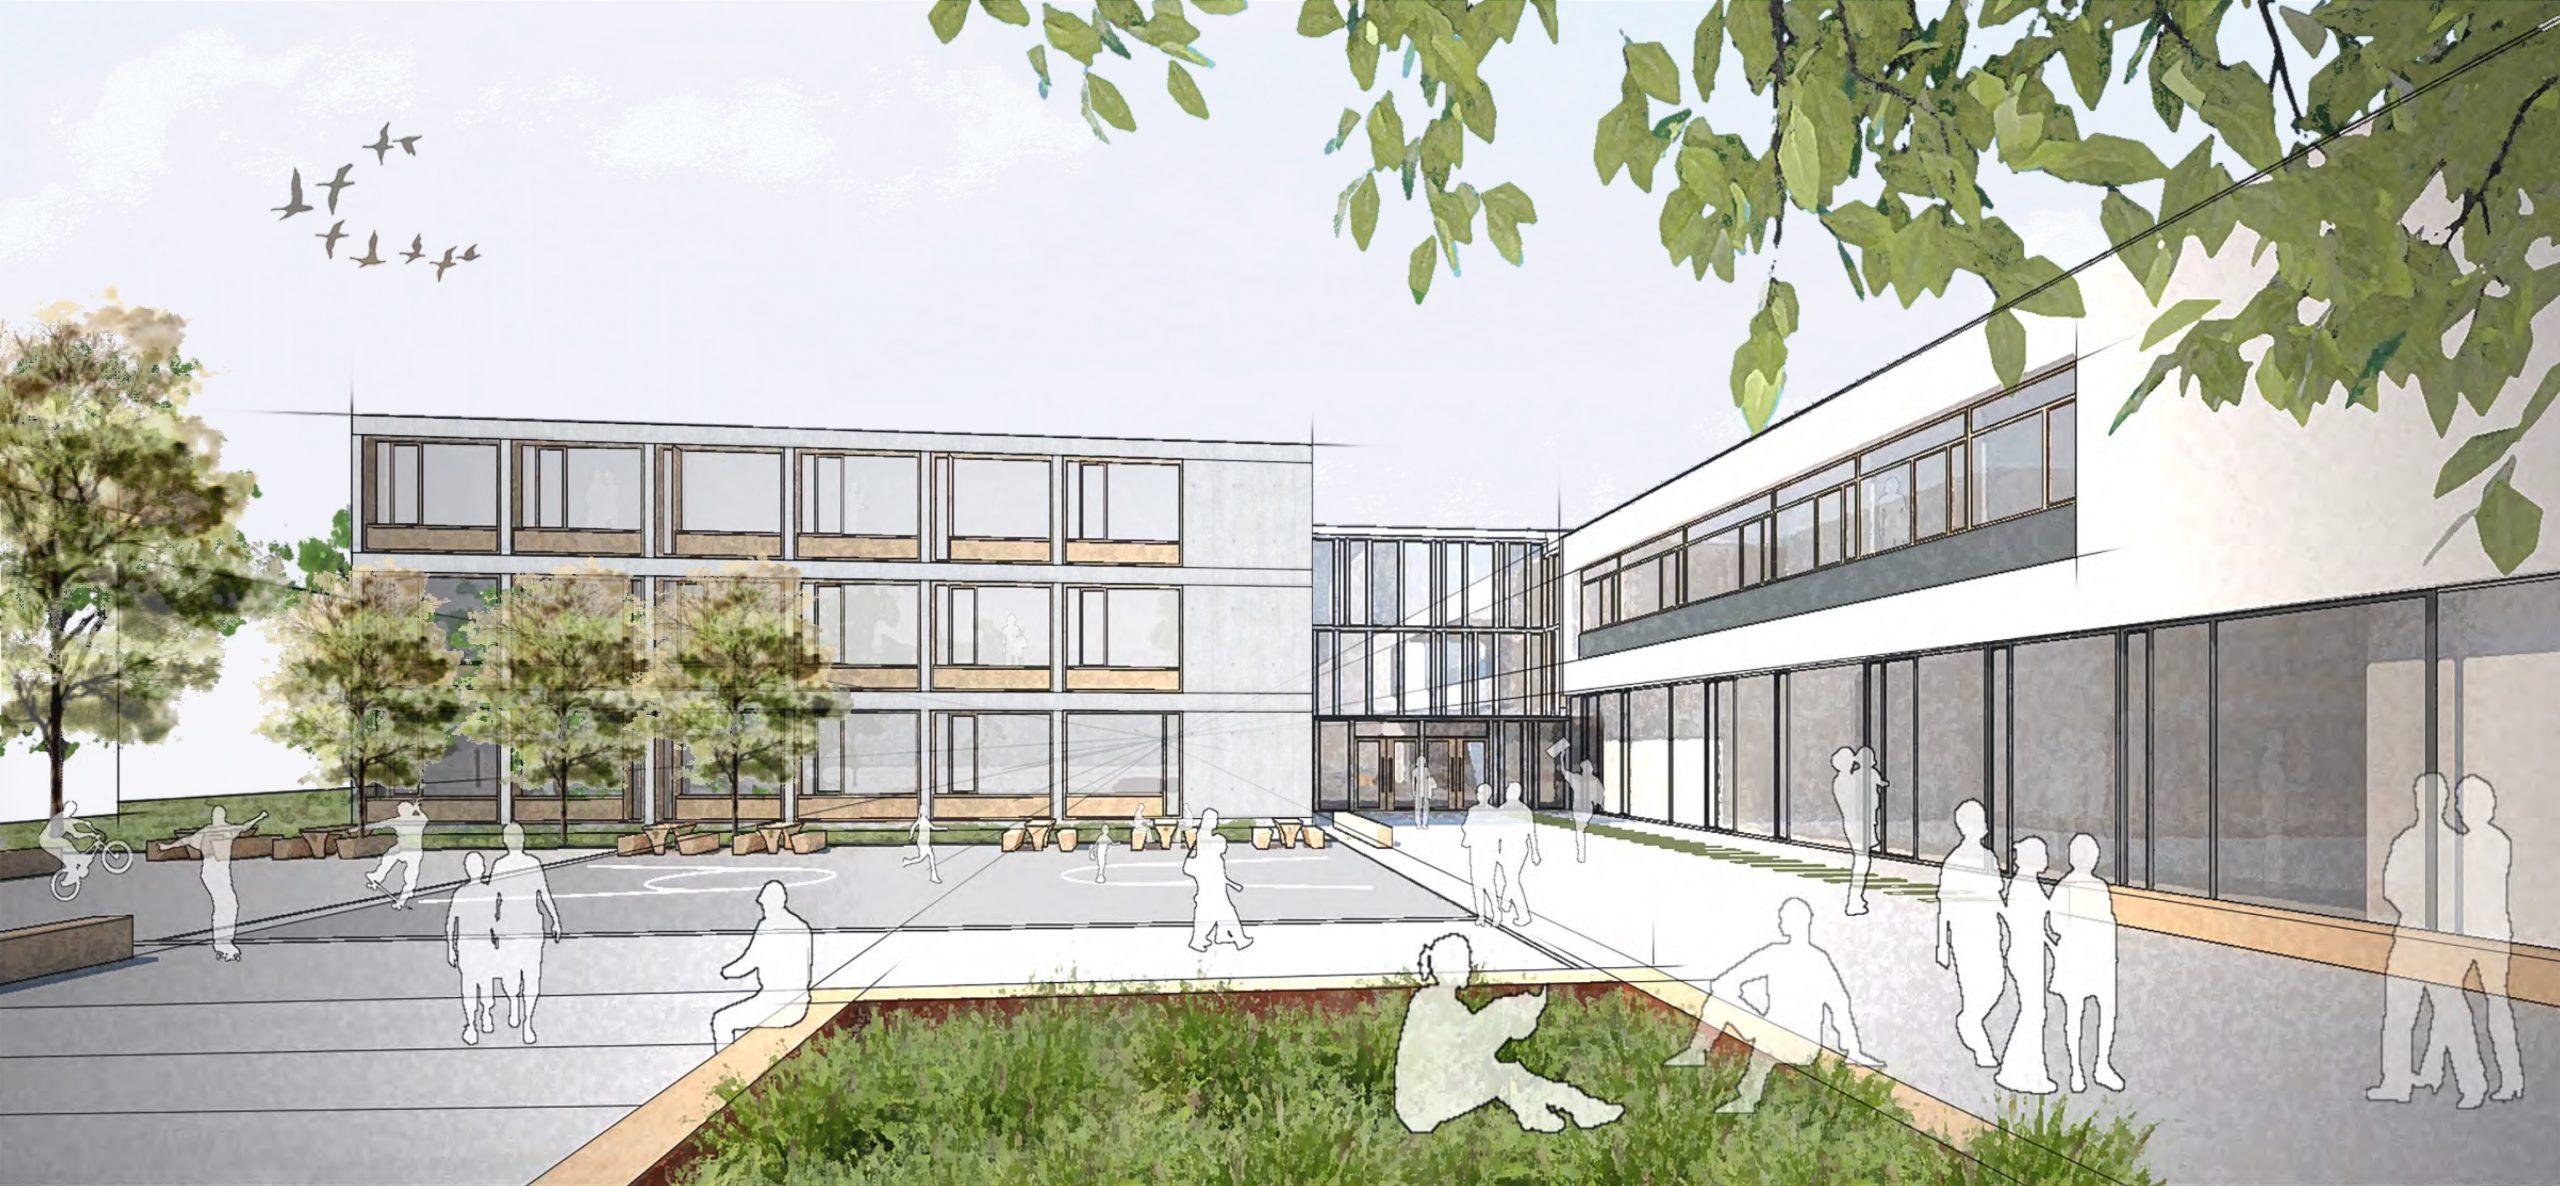 2020, Wettbewerbsbetreuung Neue Schule Esslingen